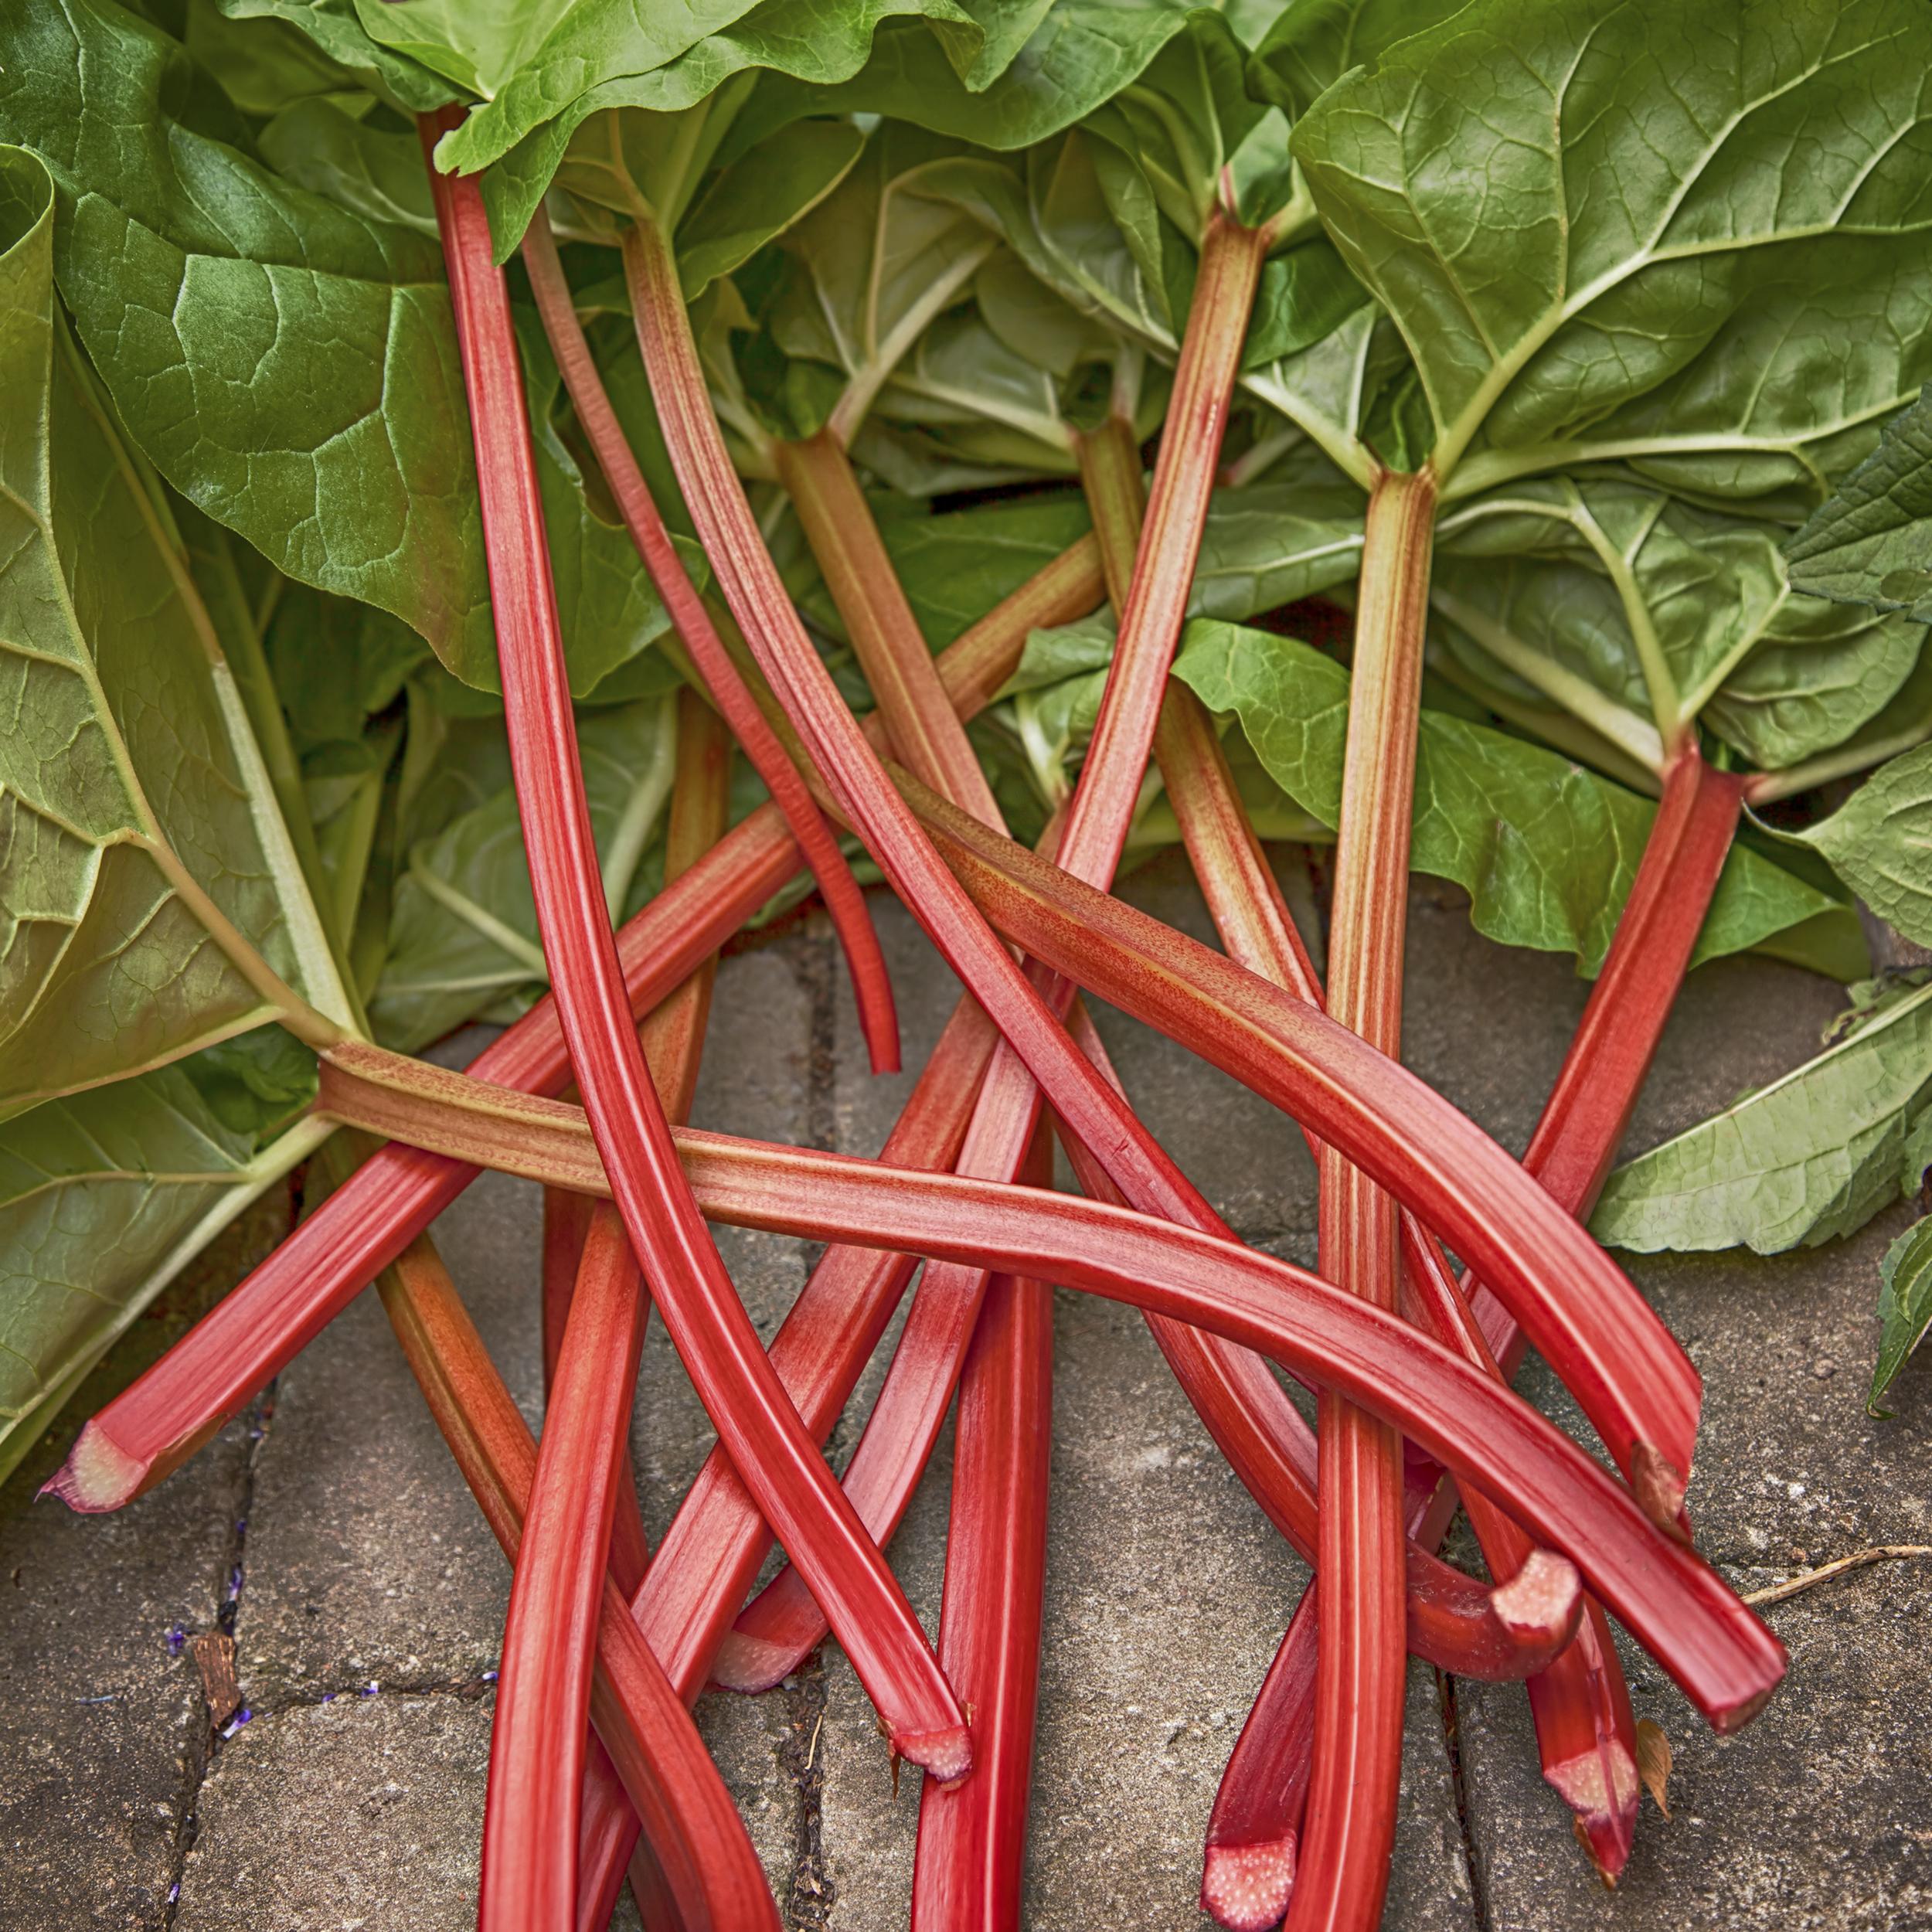 Rhubarb stocks and leaves